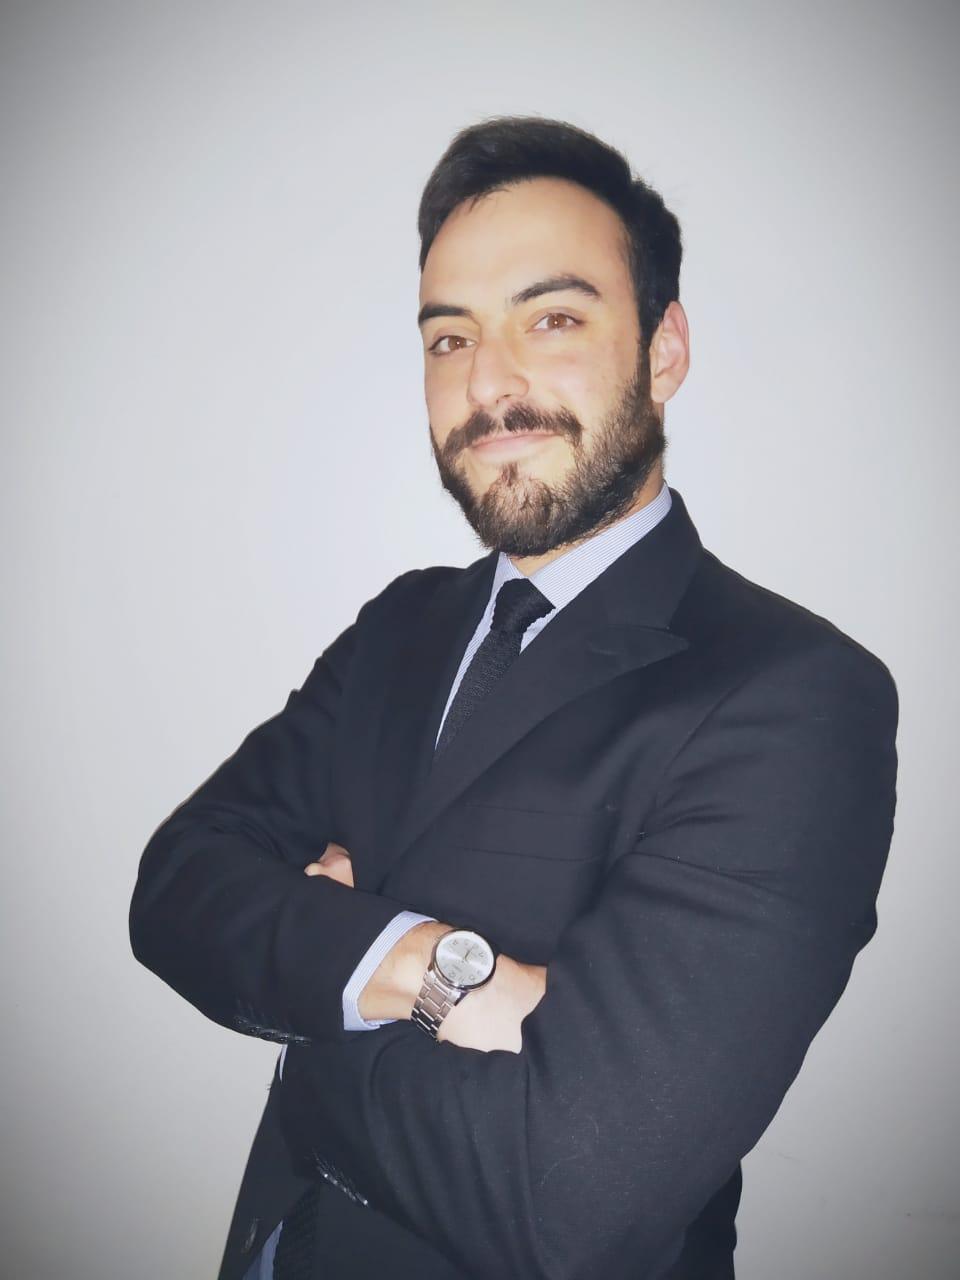 Víctor Briceño Crisóstomo